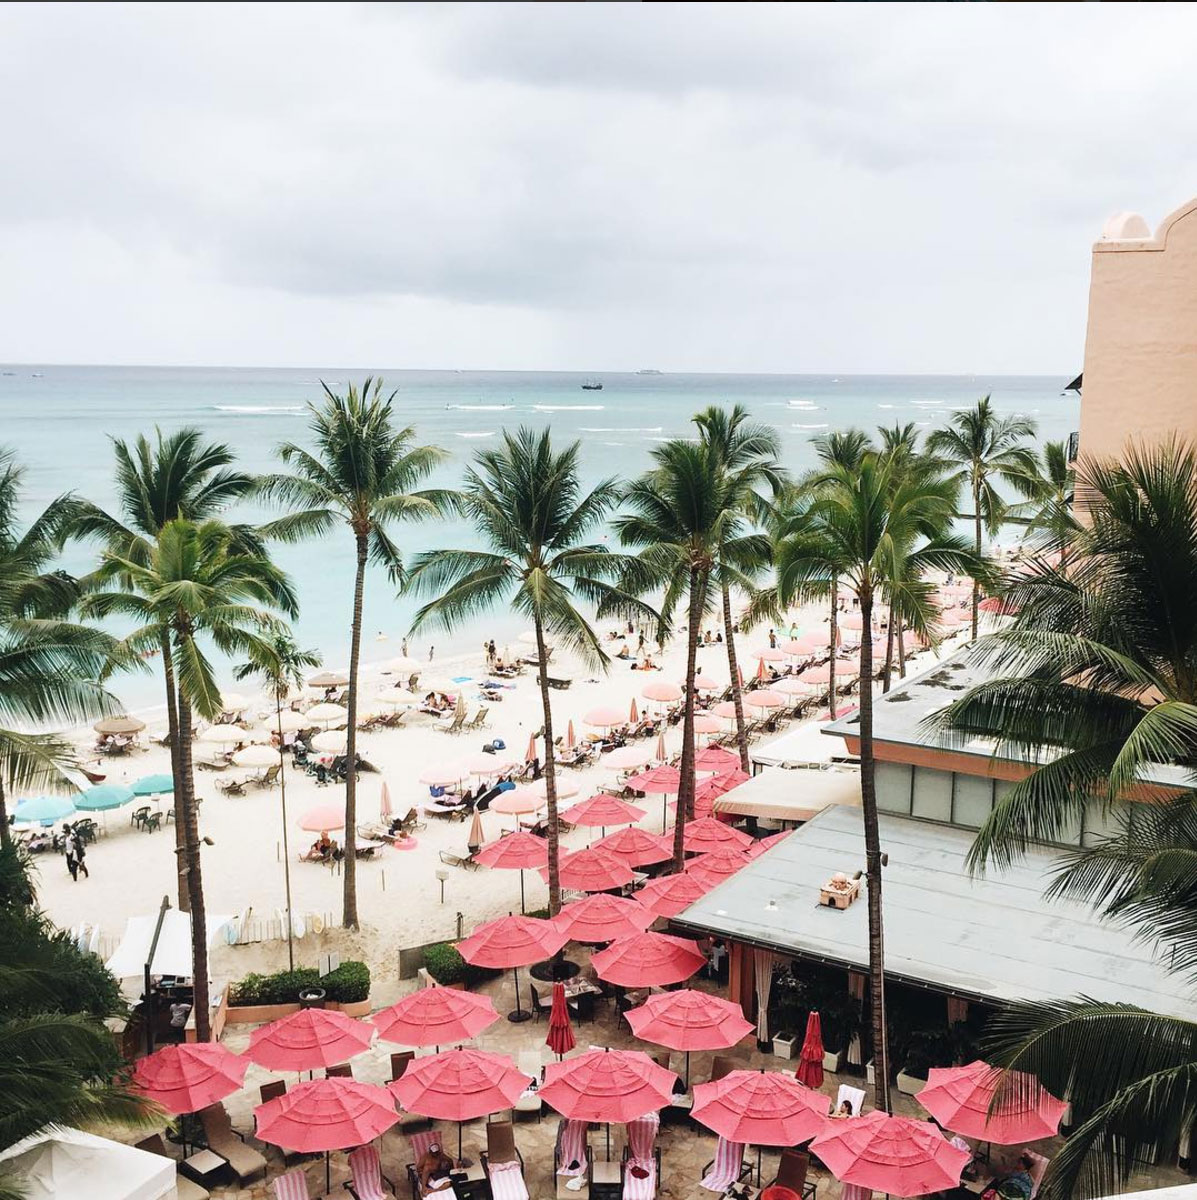 Rosa-hotell-hawaii-12